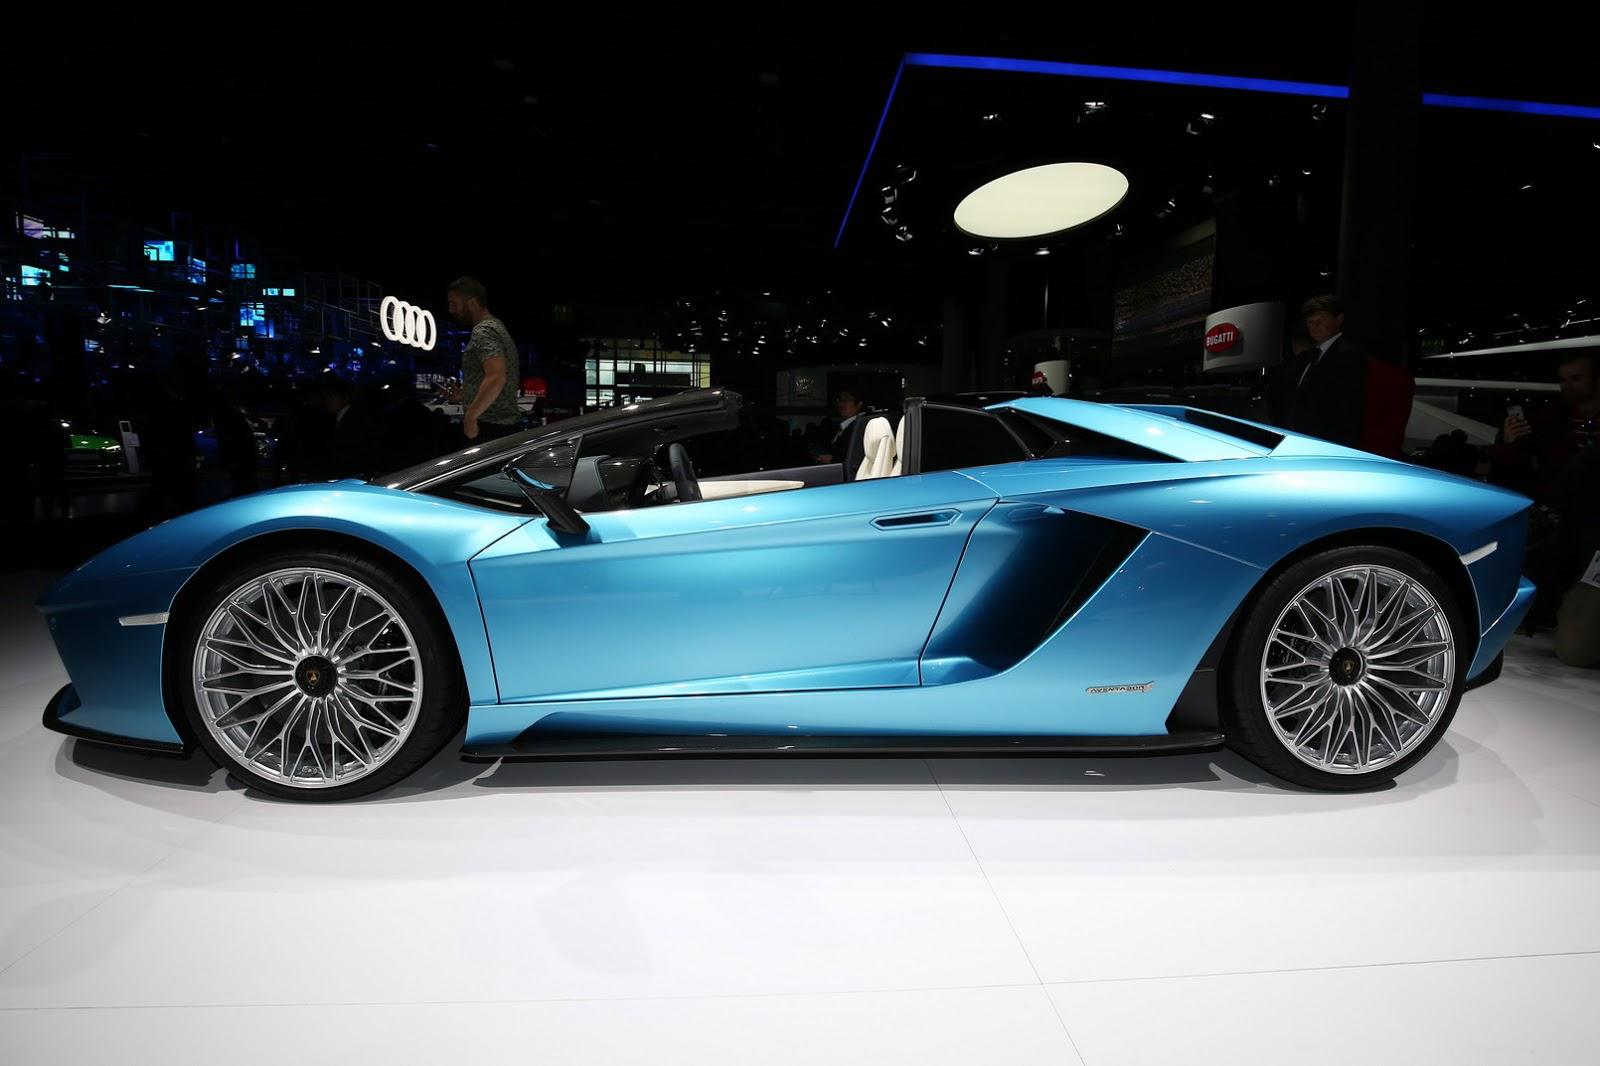 Lamborghini Aventador Roadster S facelift (22)